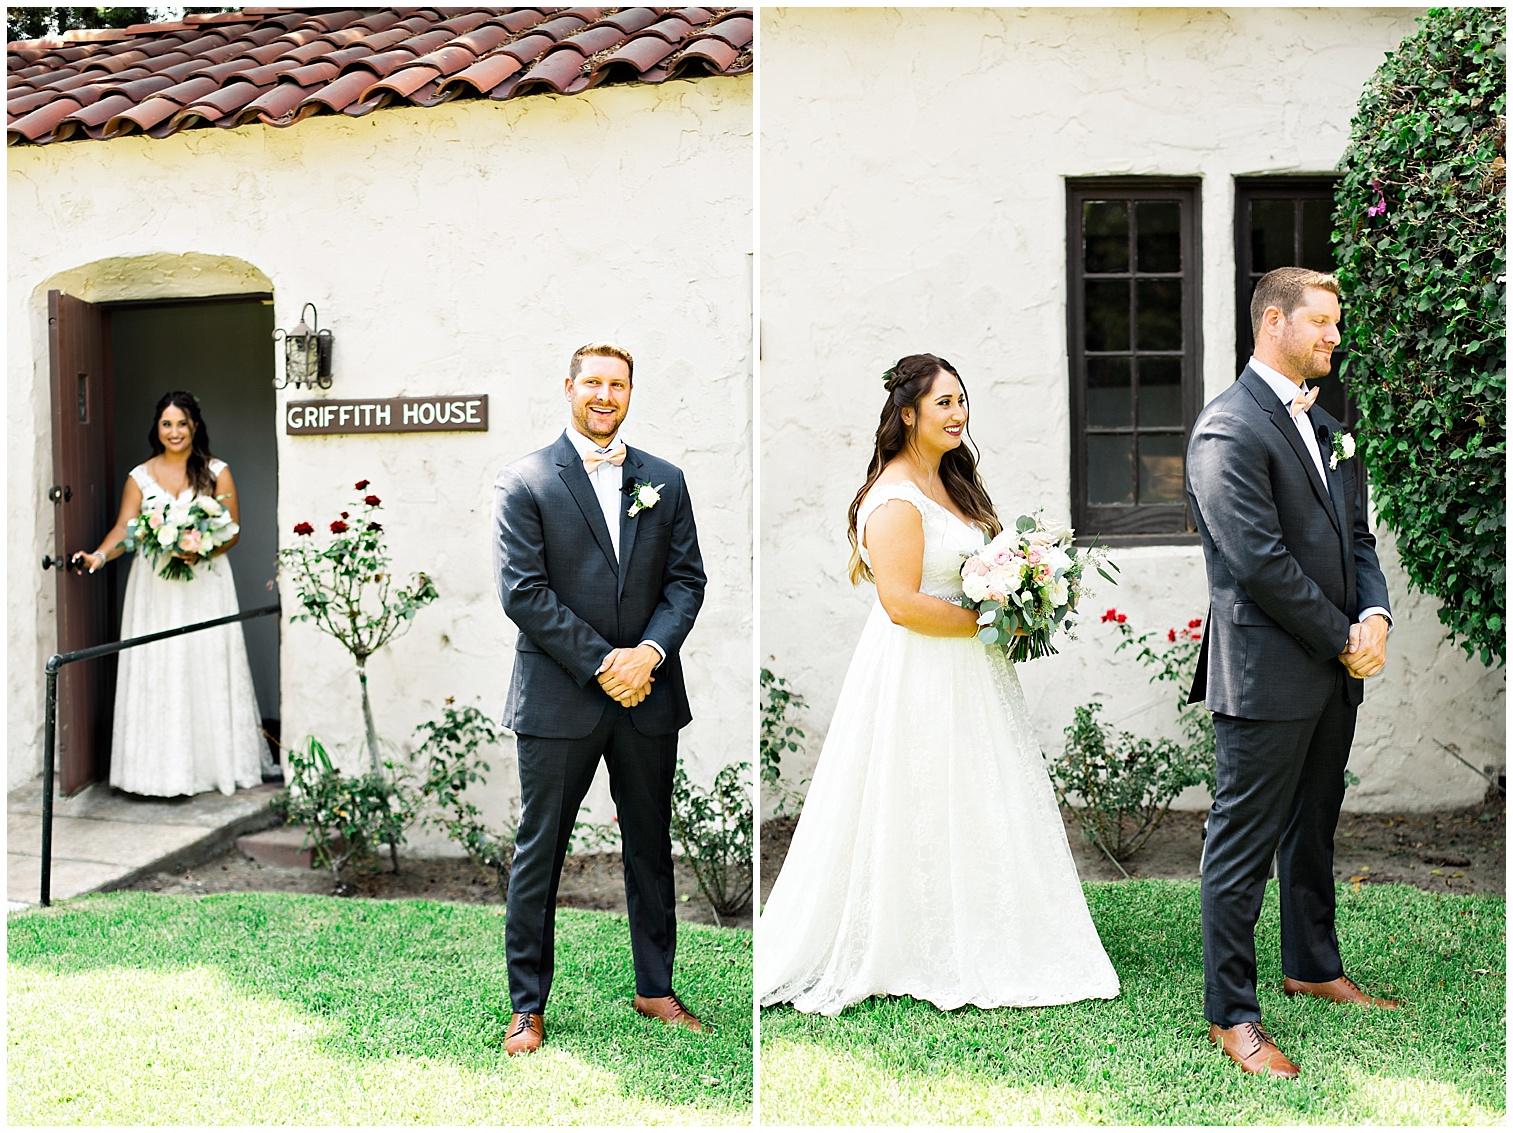 Griffith_House_Wedding_Photography_0548.jpg